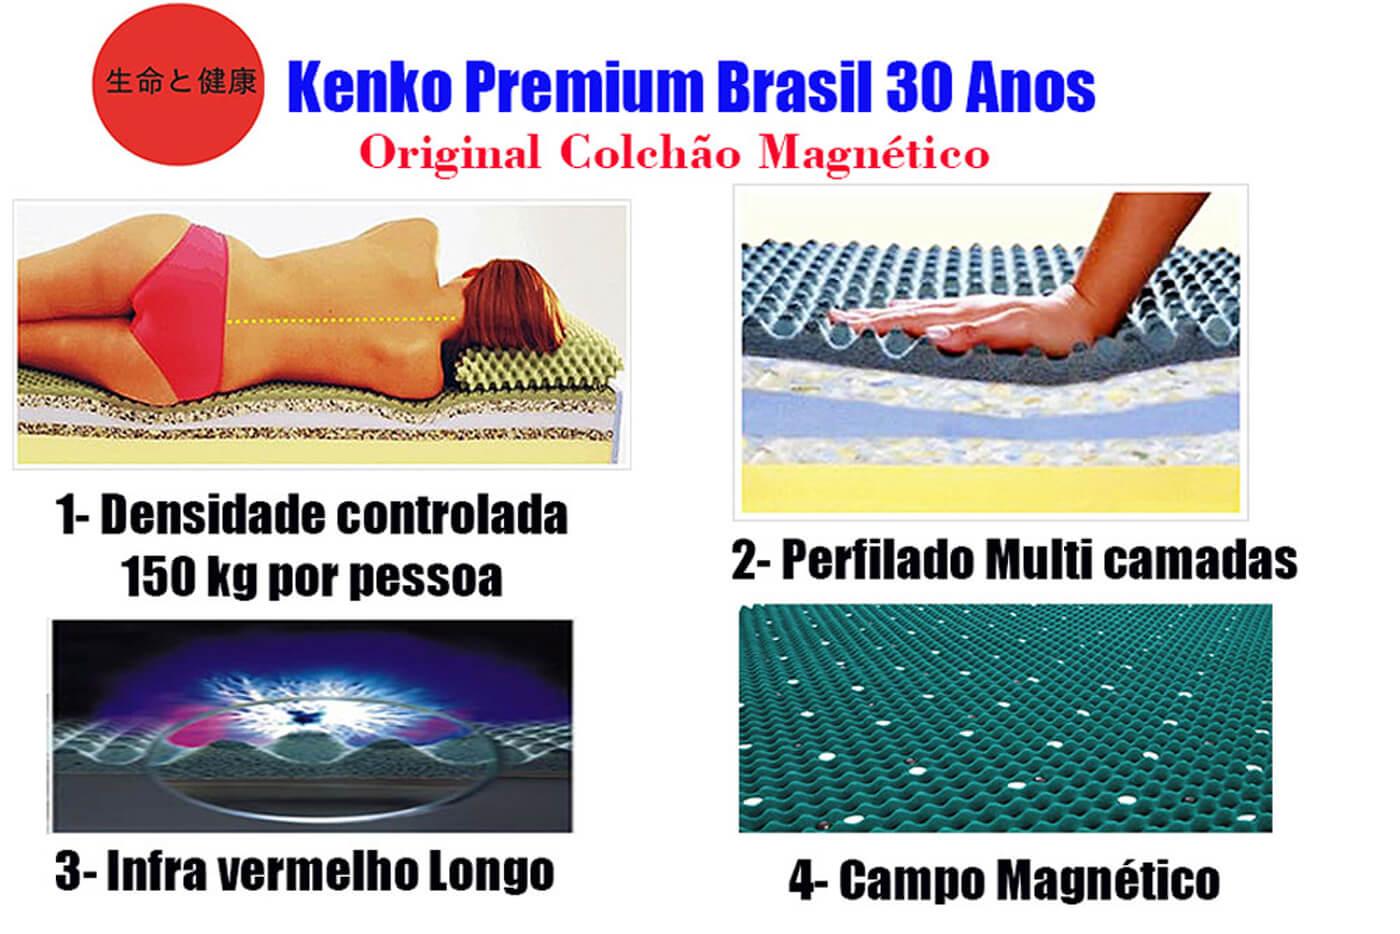 Manta Magnética Colchonete Kenko Premium Solteiro 0,88x1,88x10cm  - Kenko Premium Colchões